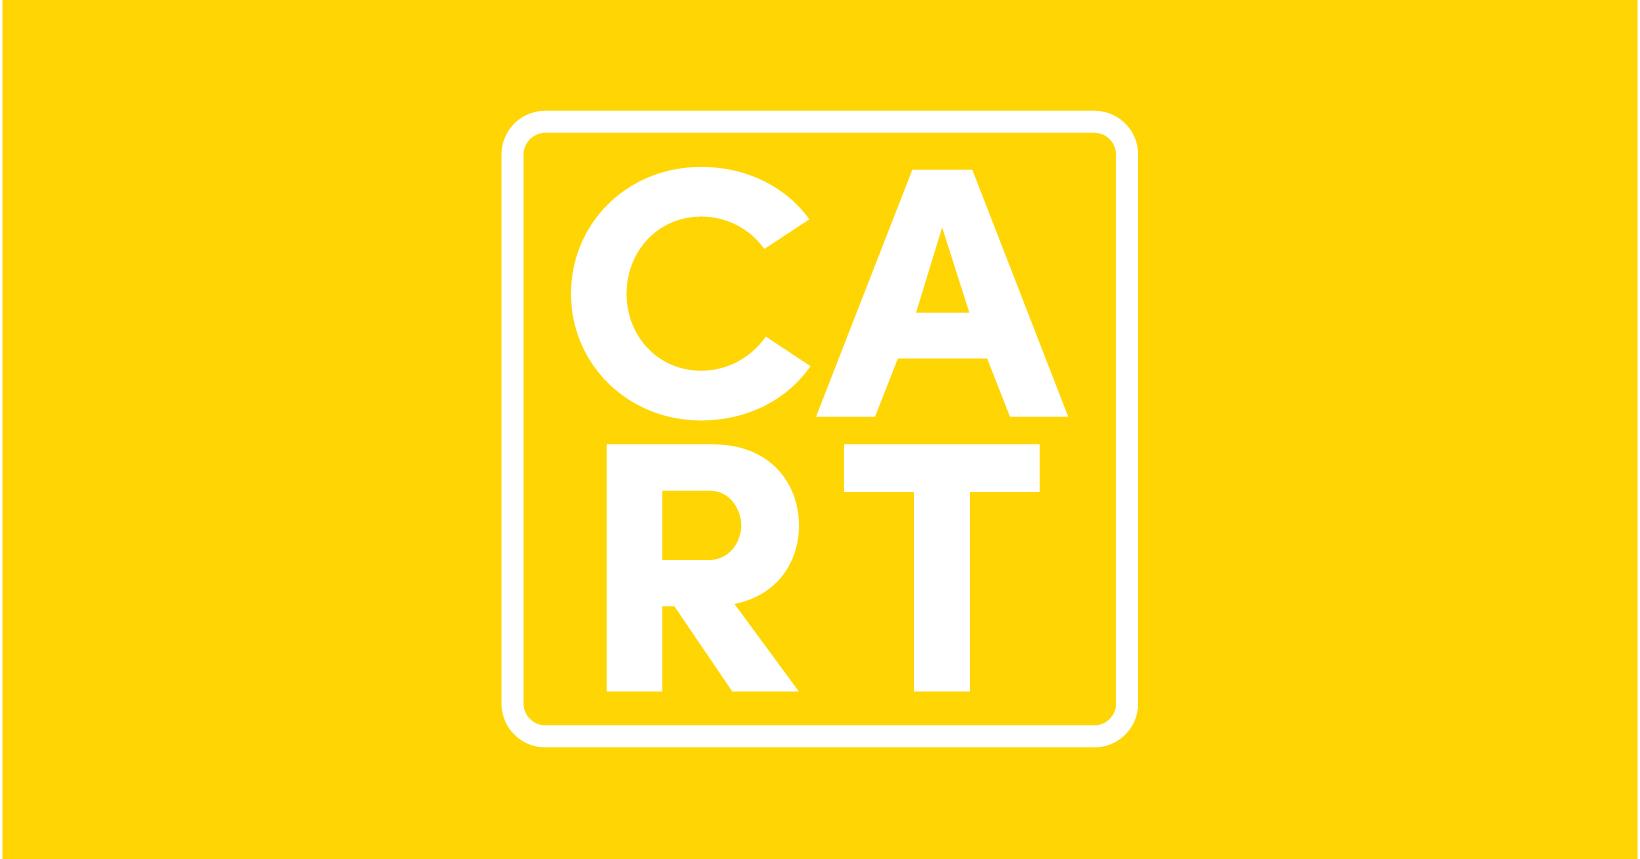 cart_group_banner.jpg